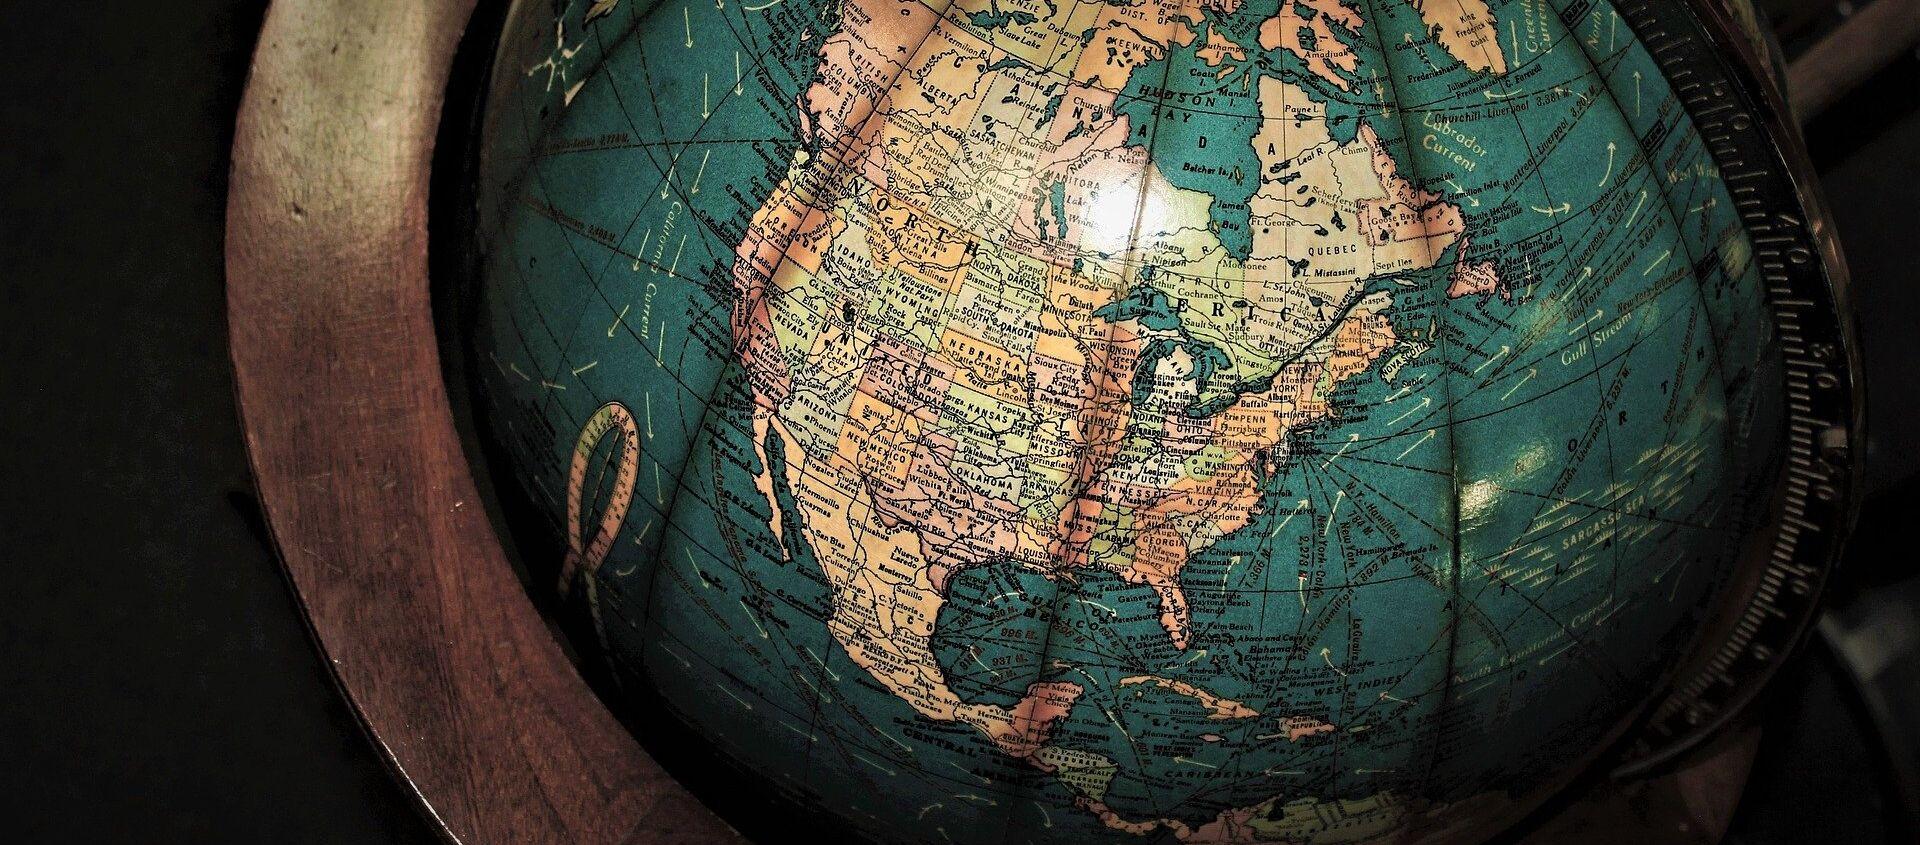 Un globo  - Sputnik Mundo, 1920, 14.01.2021